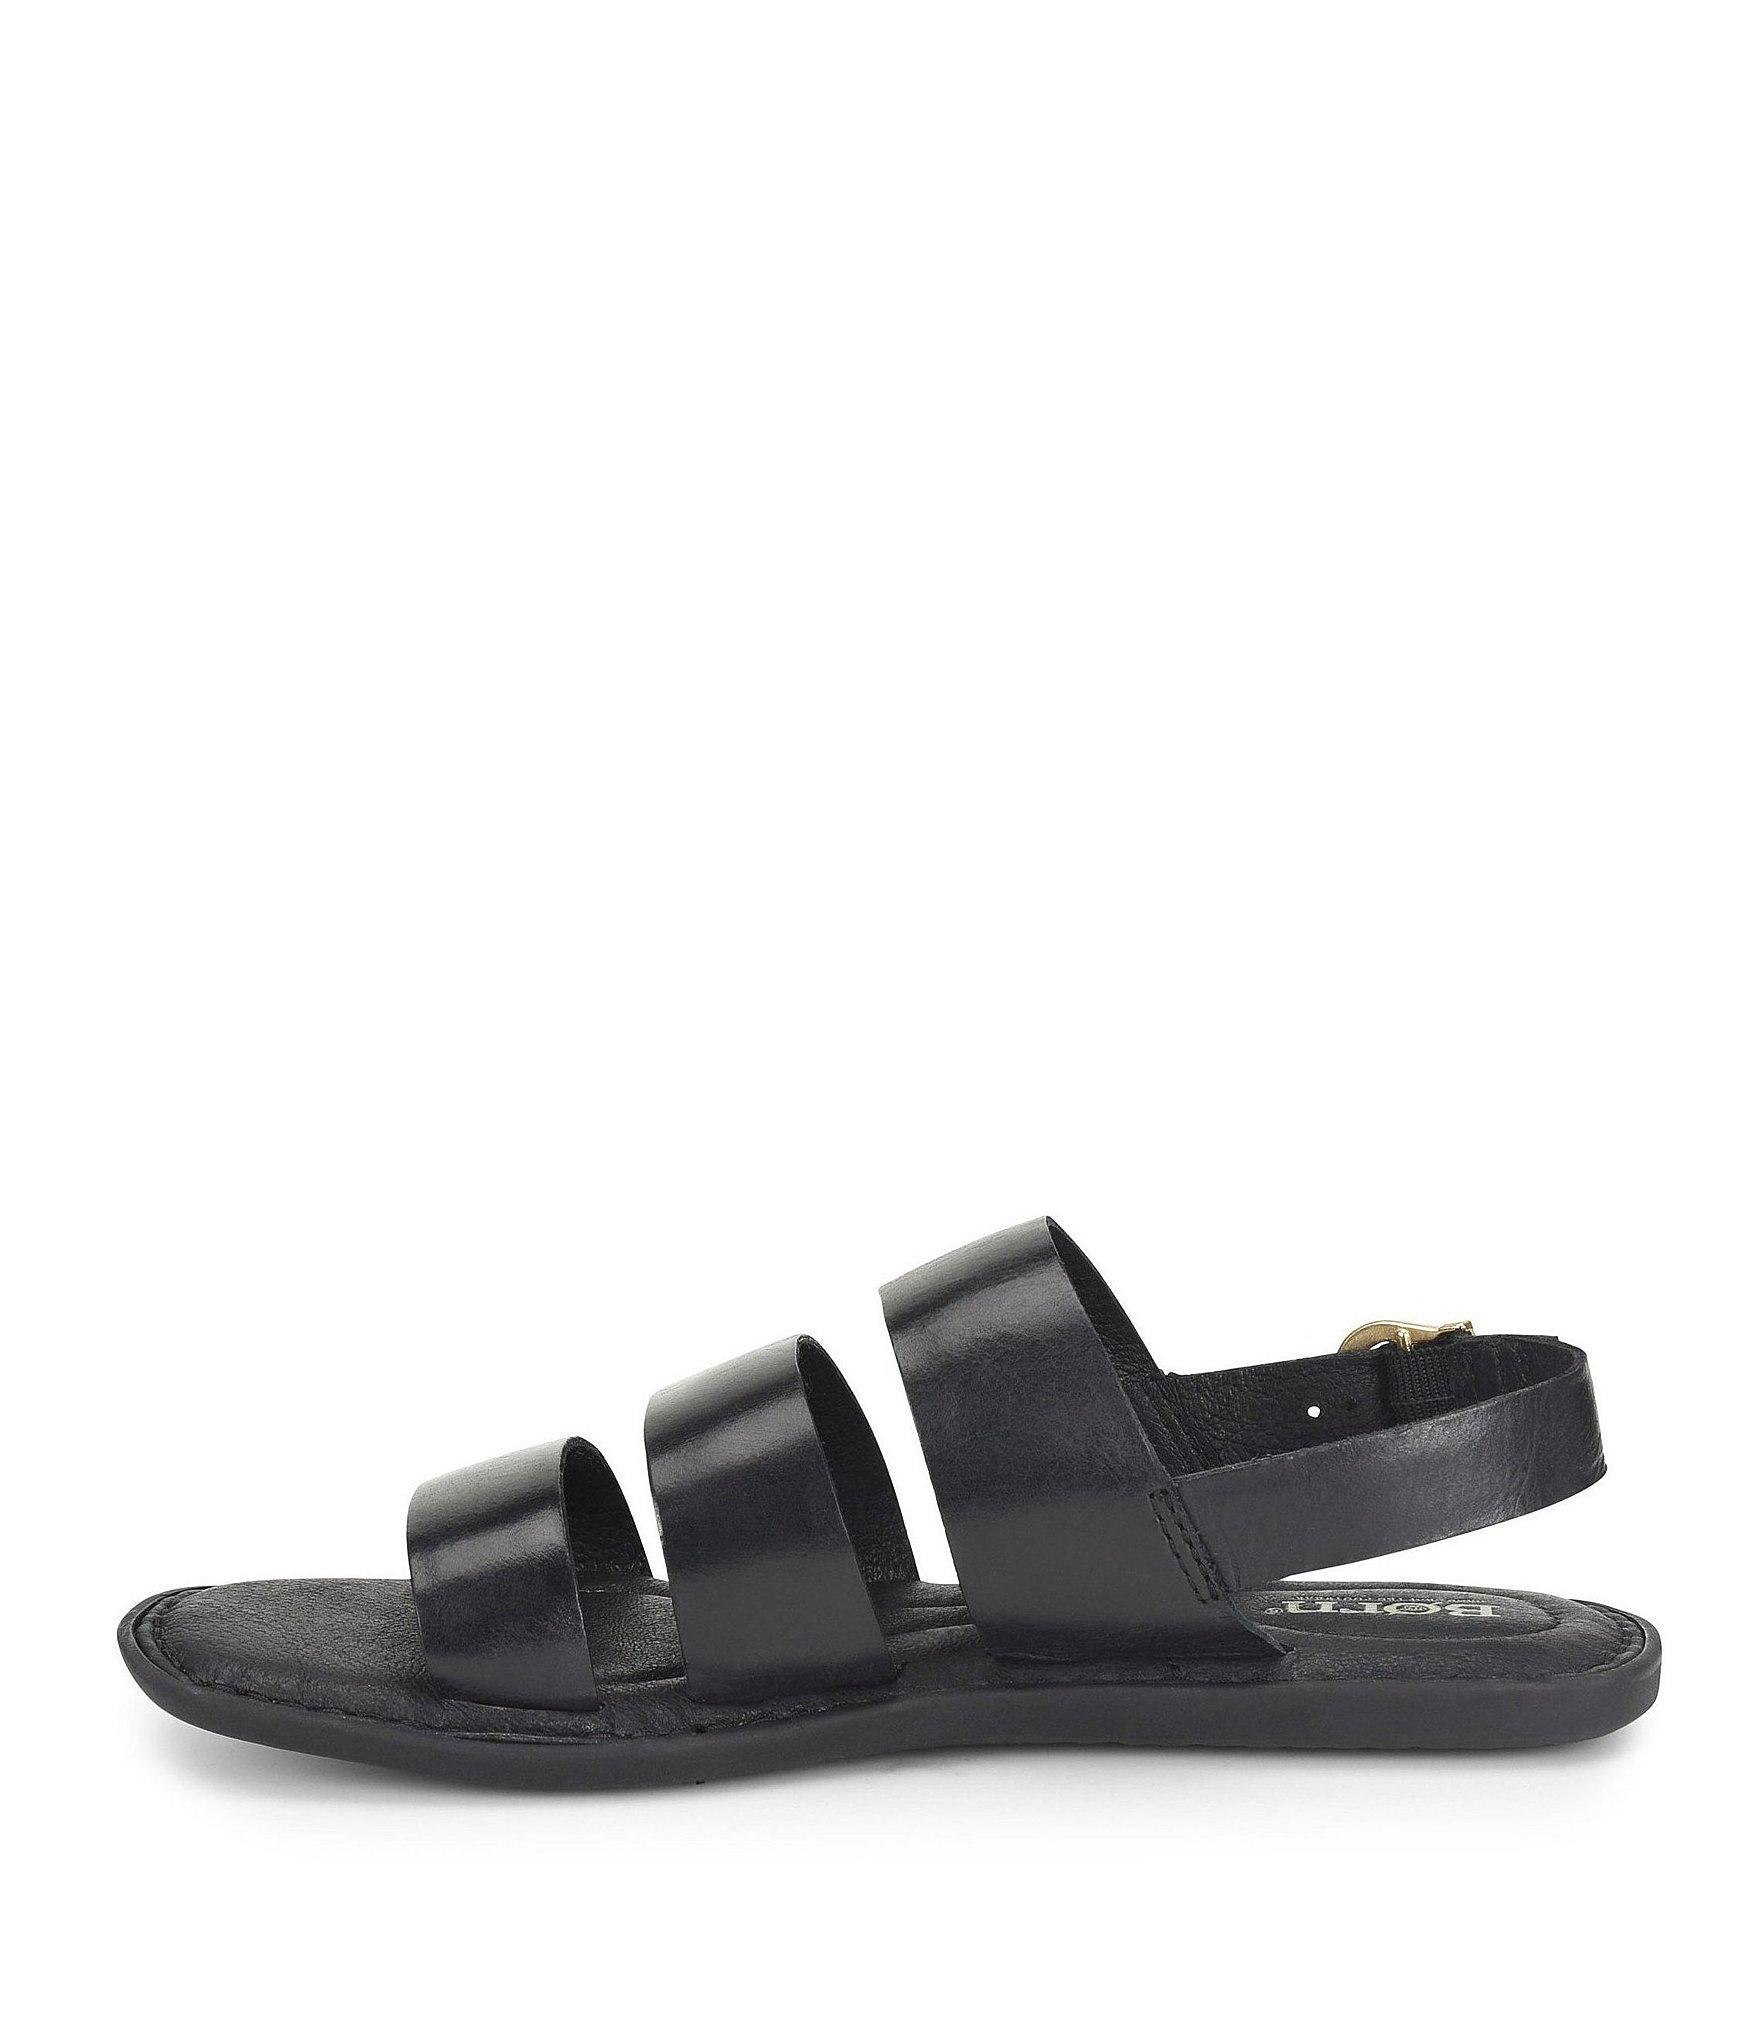 a785b5bfac1 Born Black Froya Leather Banded Sandals